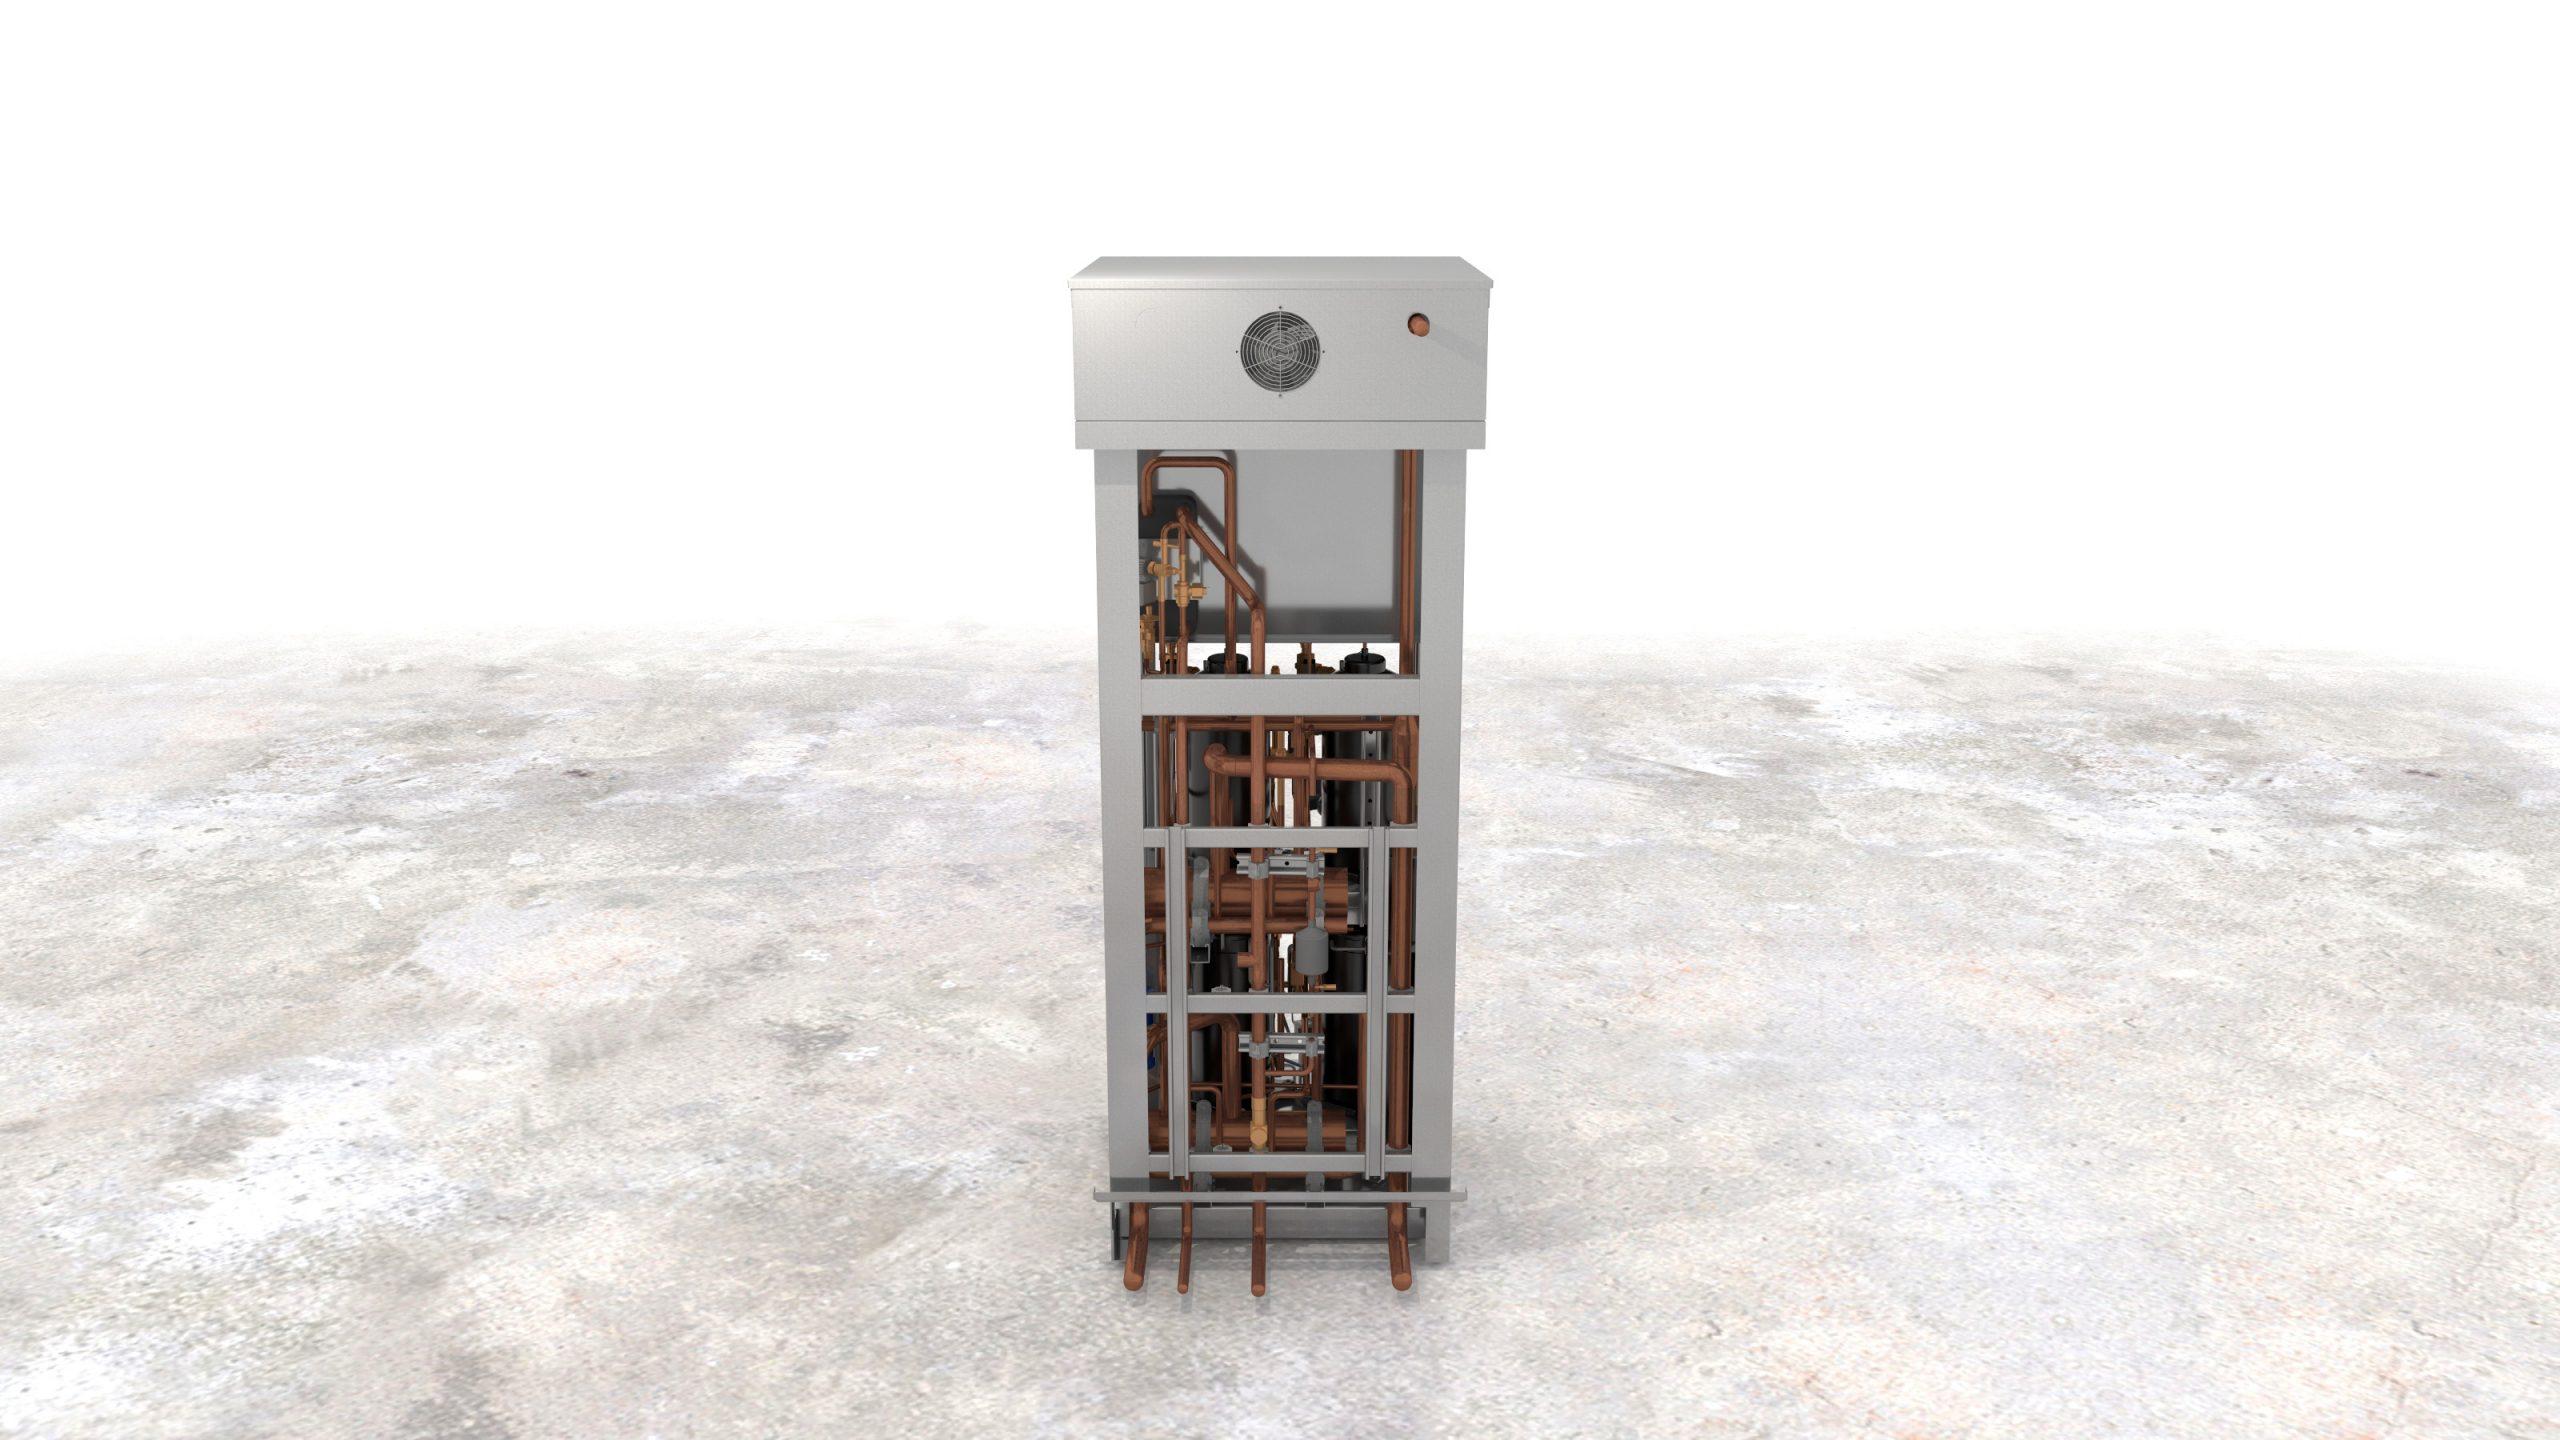 Vertical-InviroPak-refrigeration-system-4-compressor_1_2